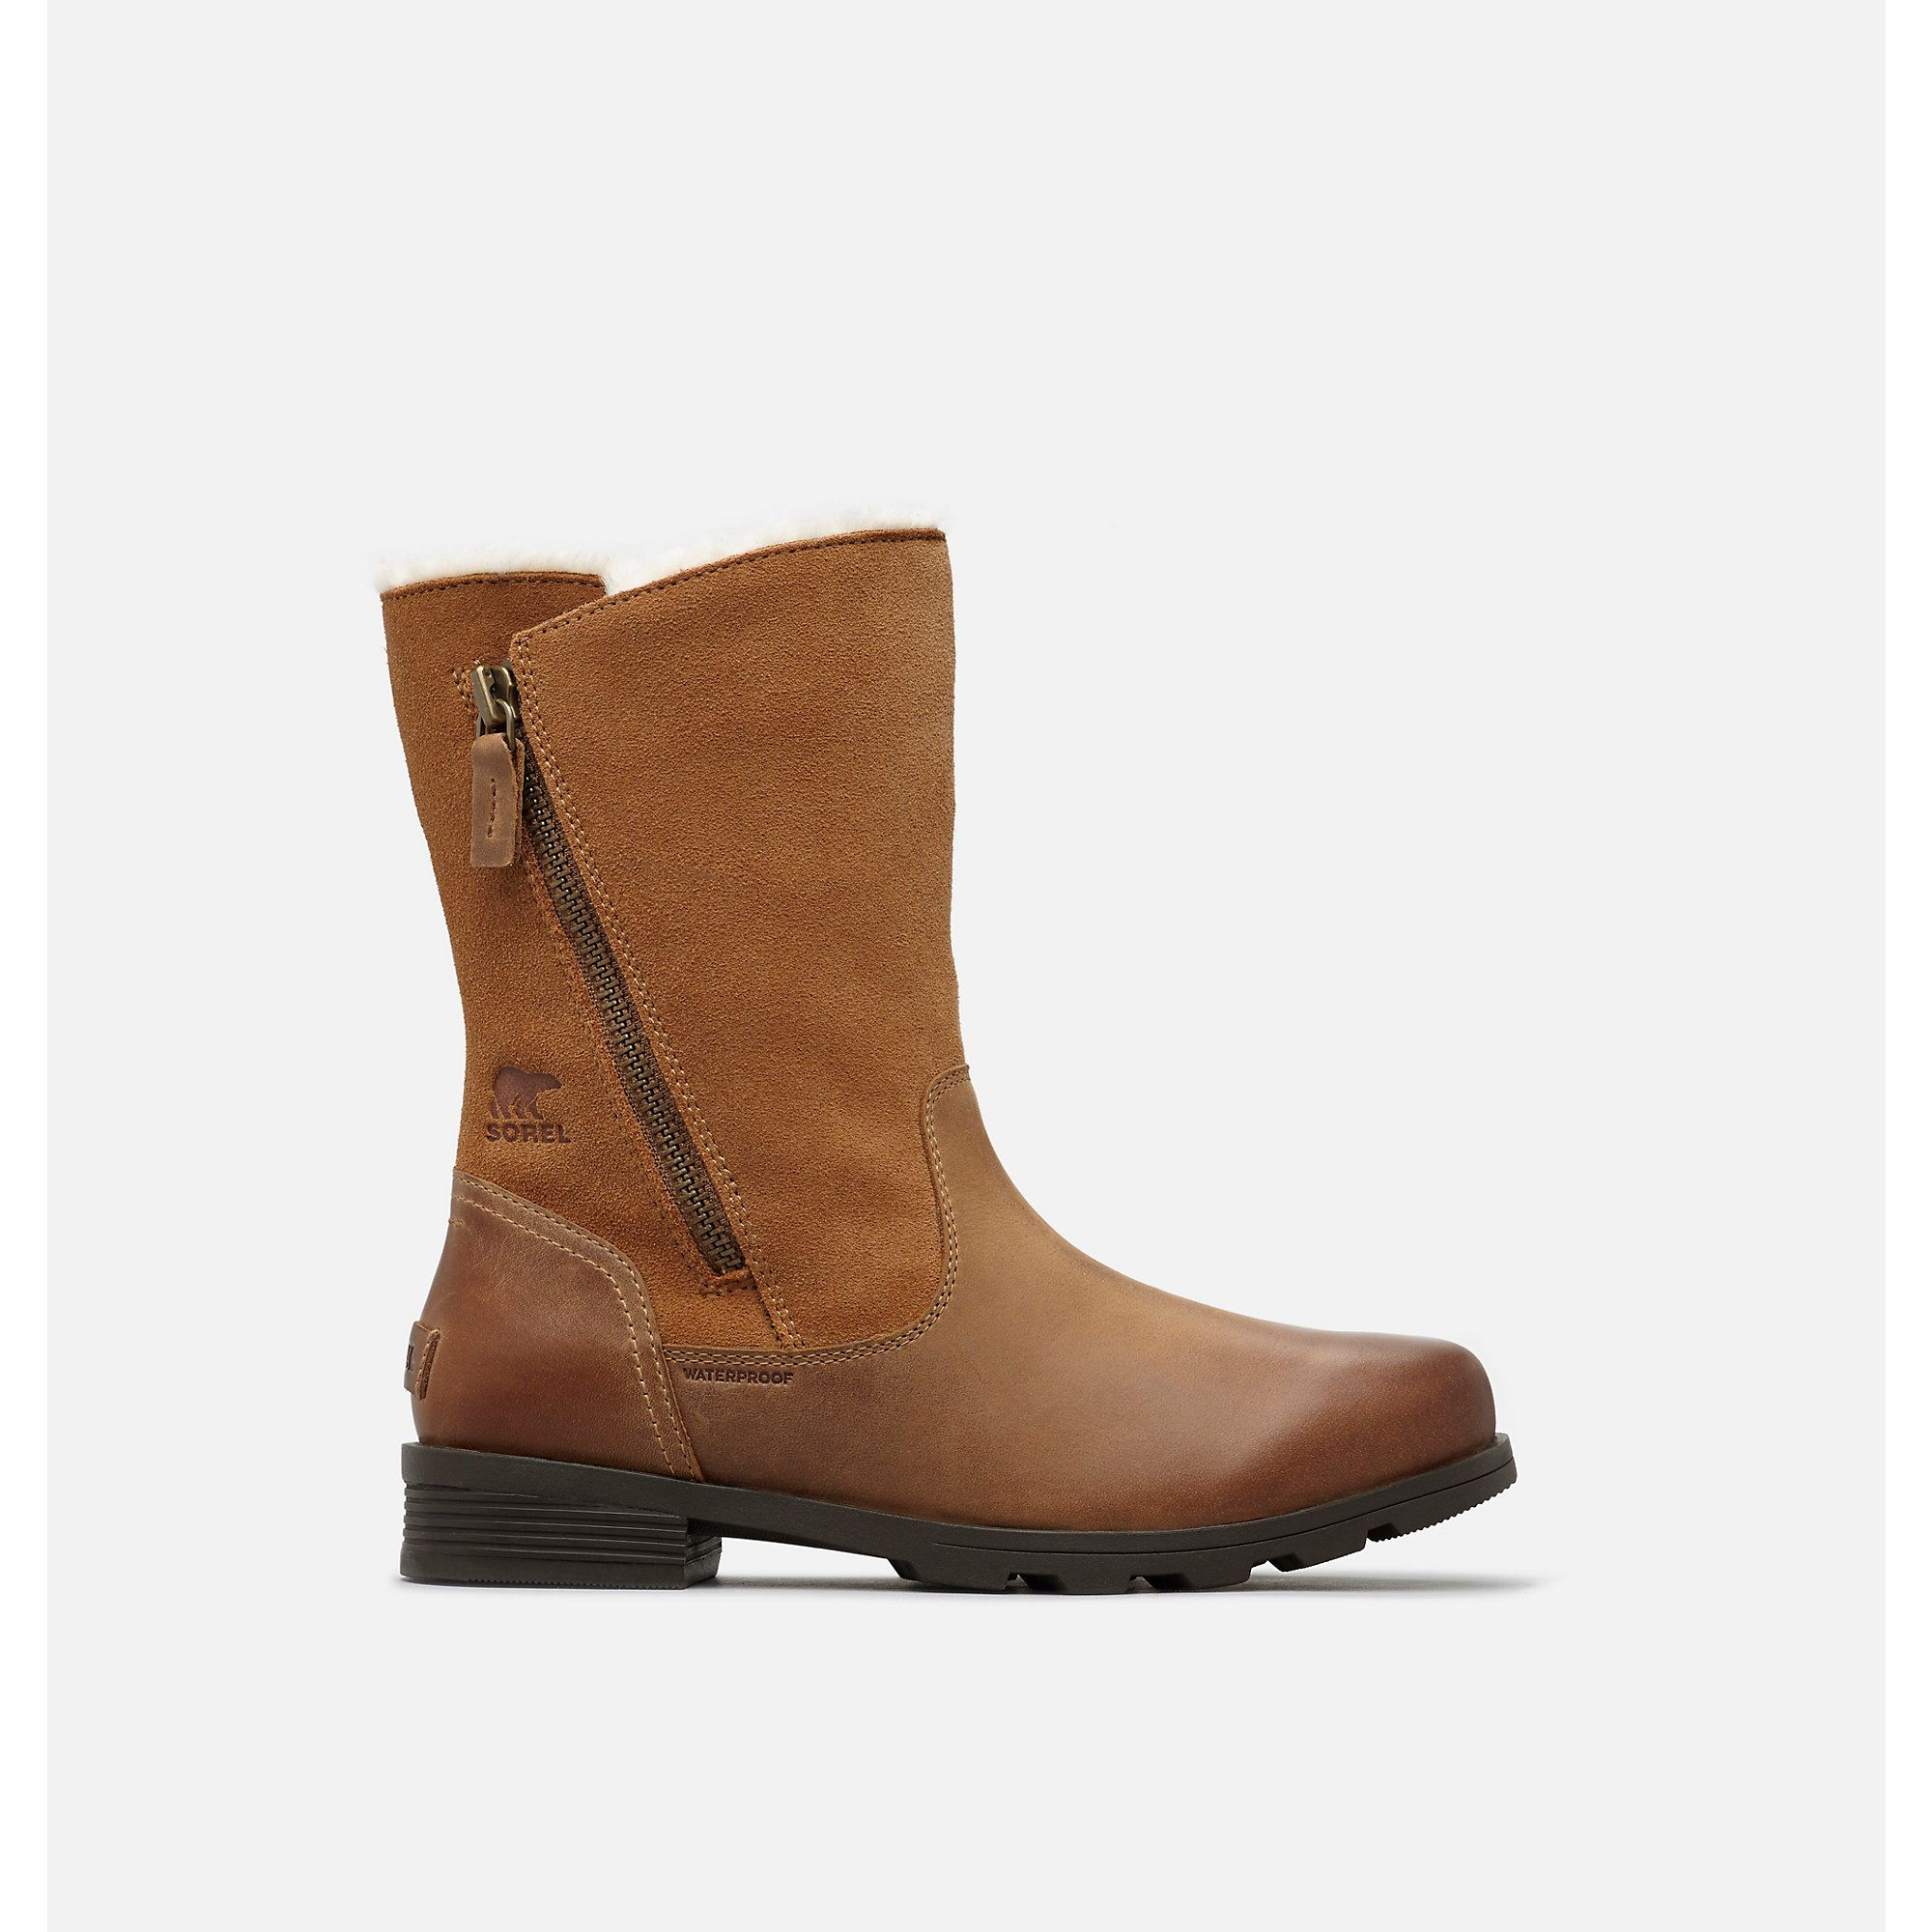 279973781437a1 SOREL EMELIE FOLDOVER Size 7.5 - Camel Brown